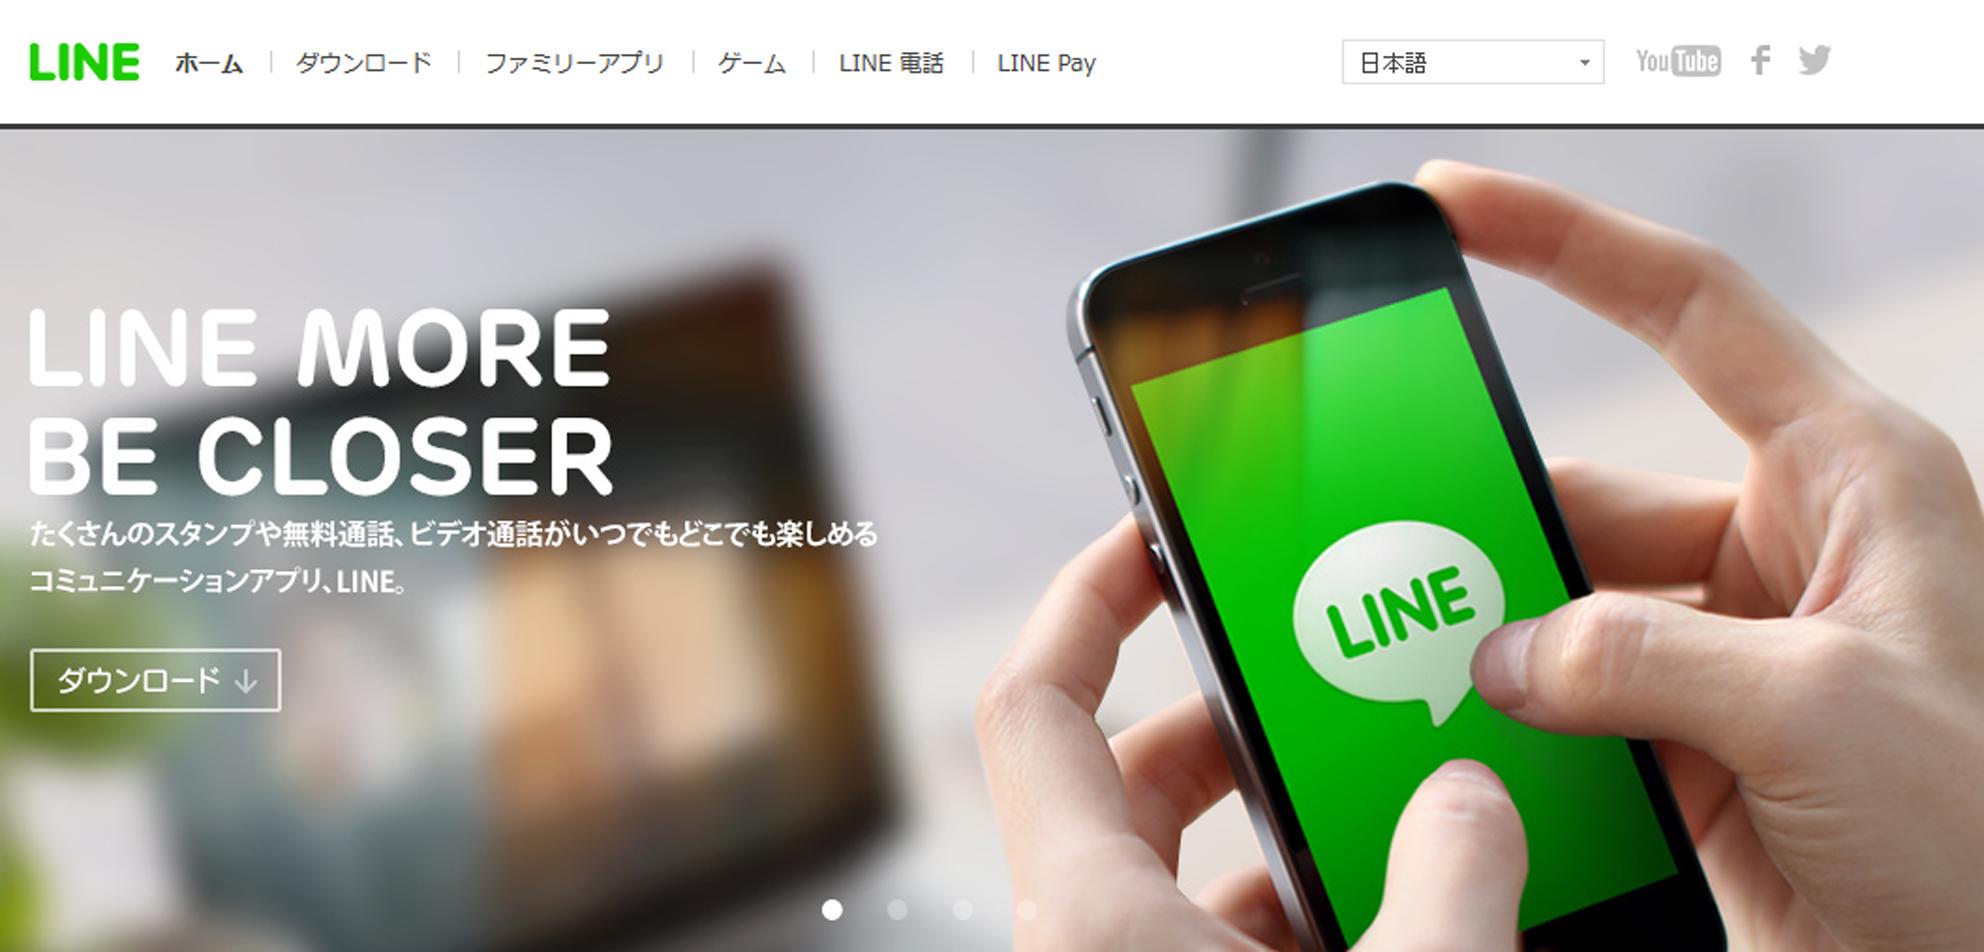 「LINE」が上場手続きを再申請!盛り上がる関連企業銘柄